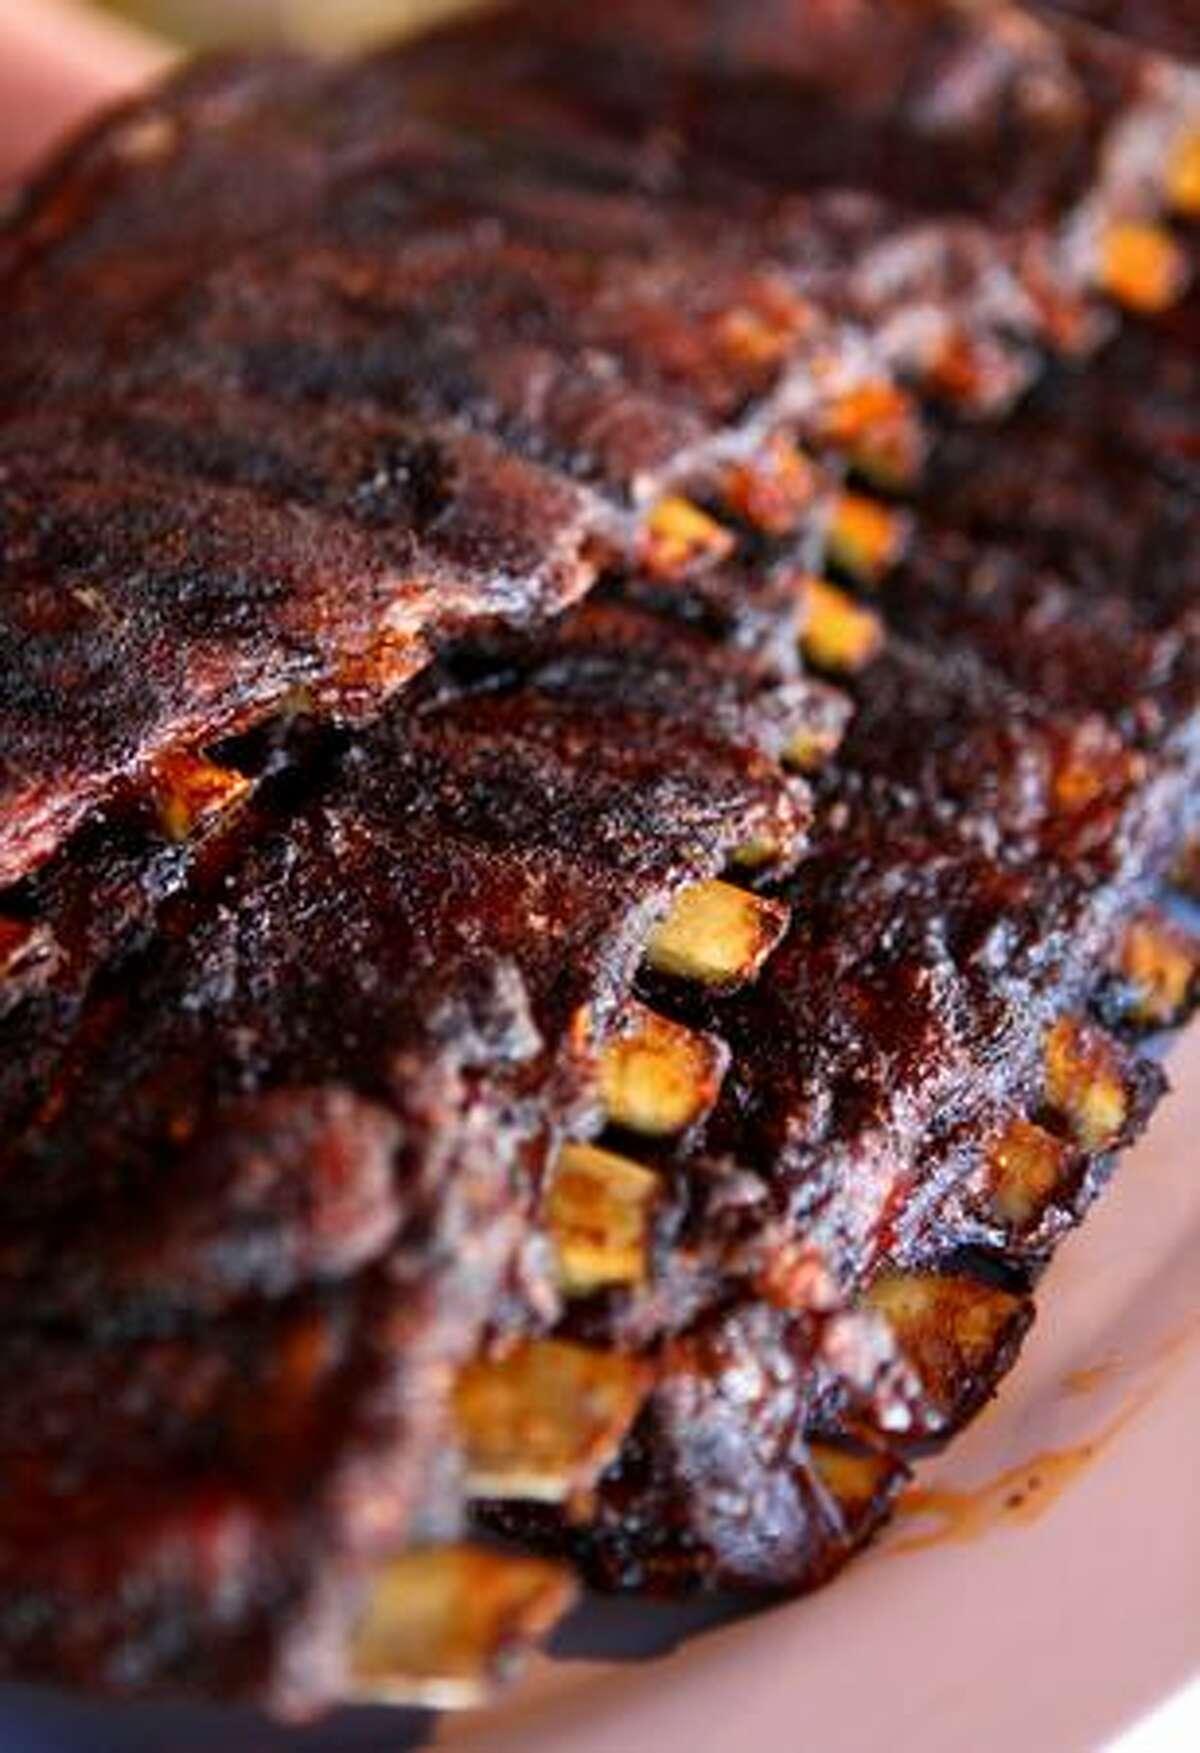 A plate of ribs prepared at Julie Reinhardt's restaurant Smoking Pete's BBQ.